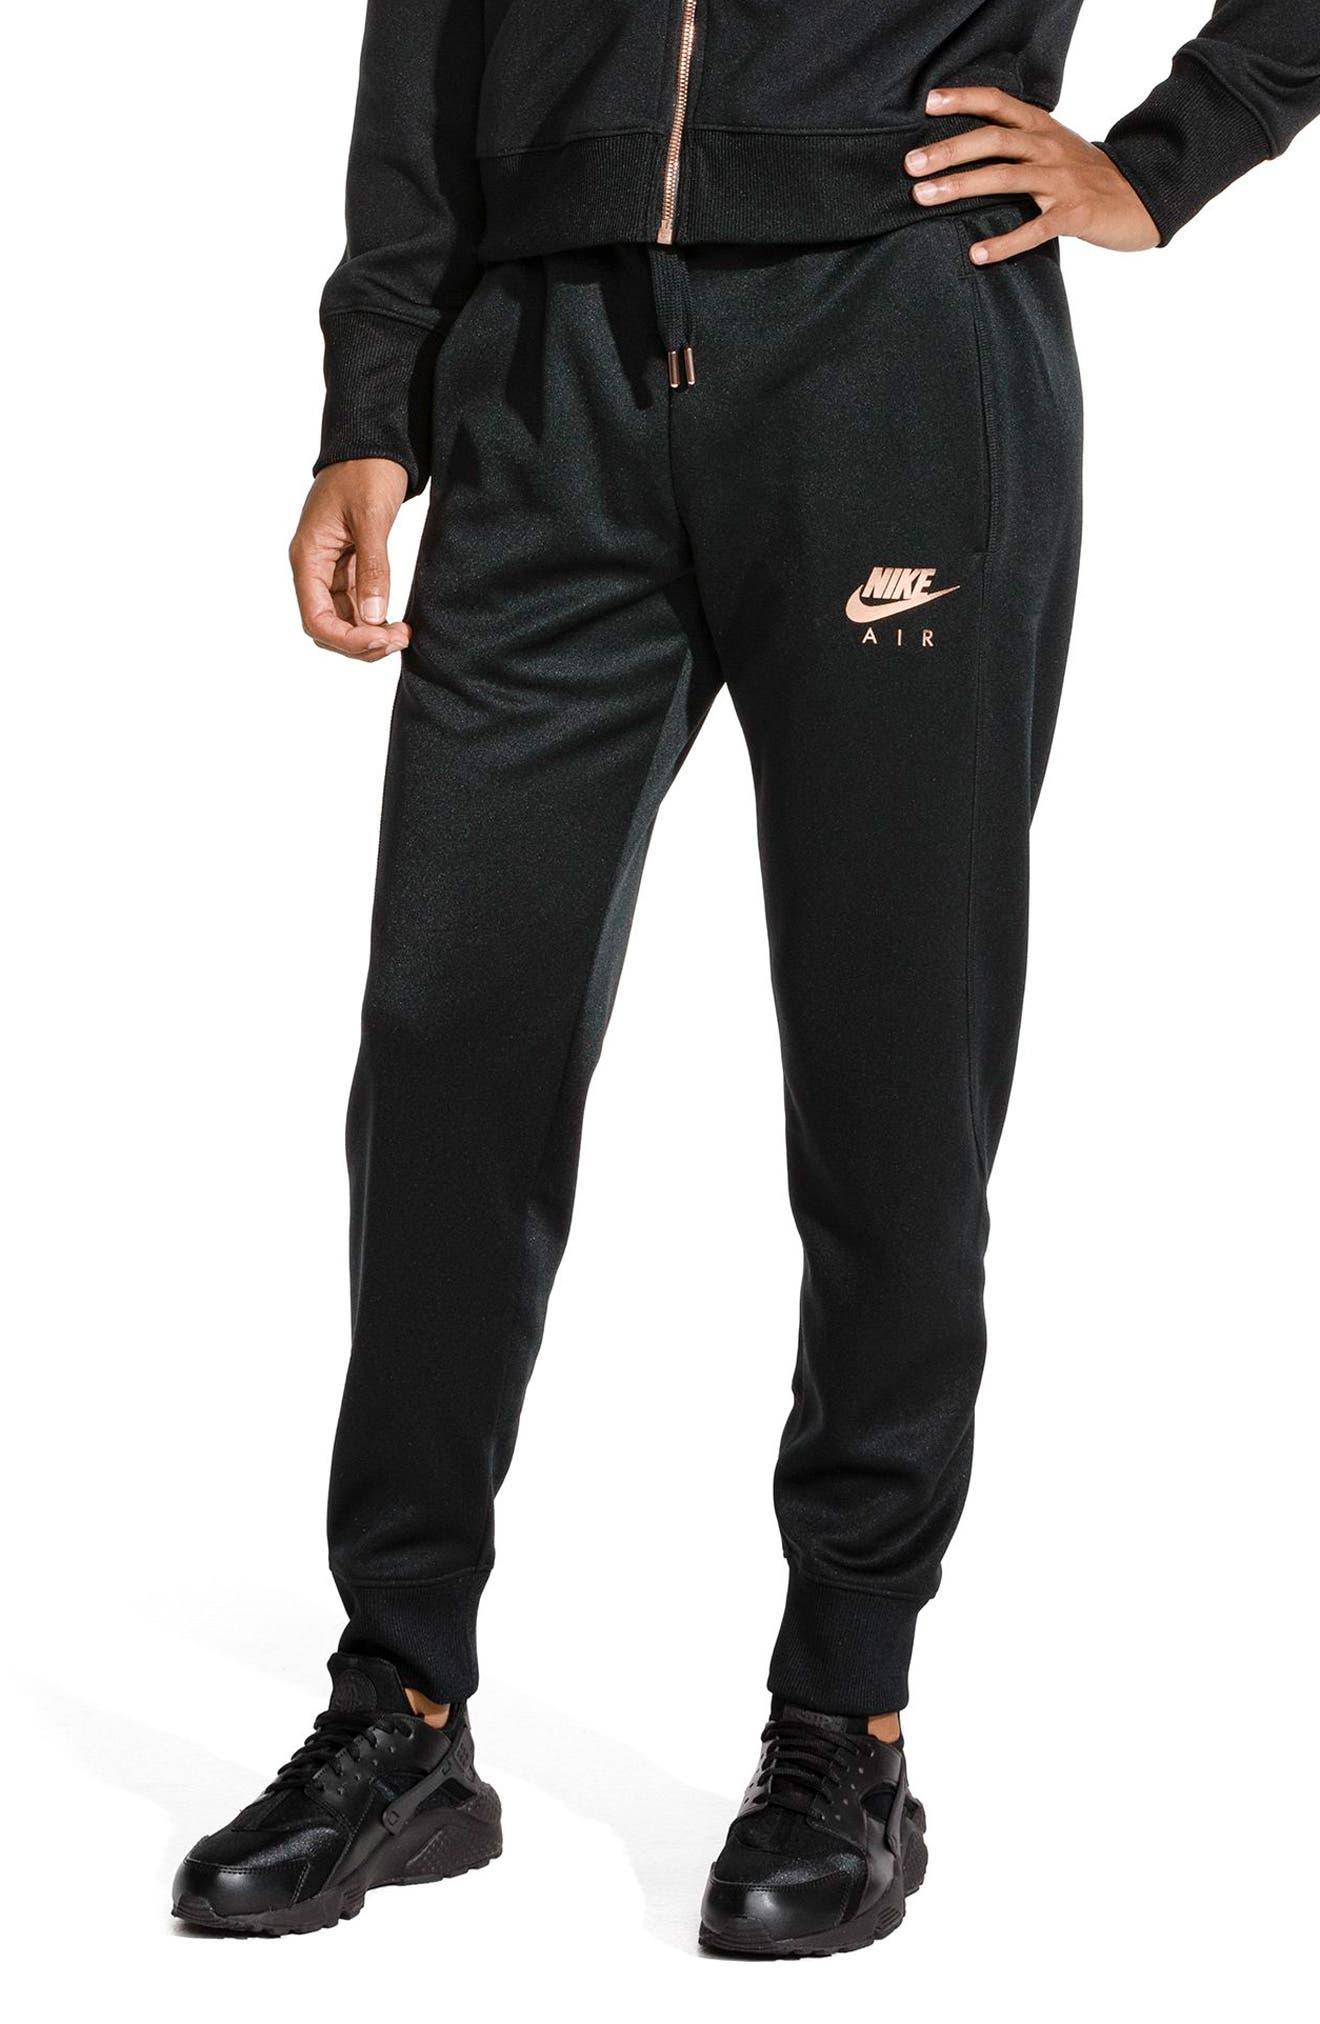 Sportswear Air Jogger Pants,                         Main,                         color, 010